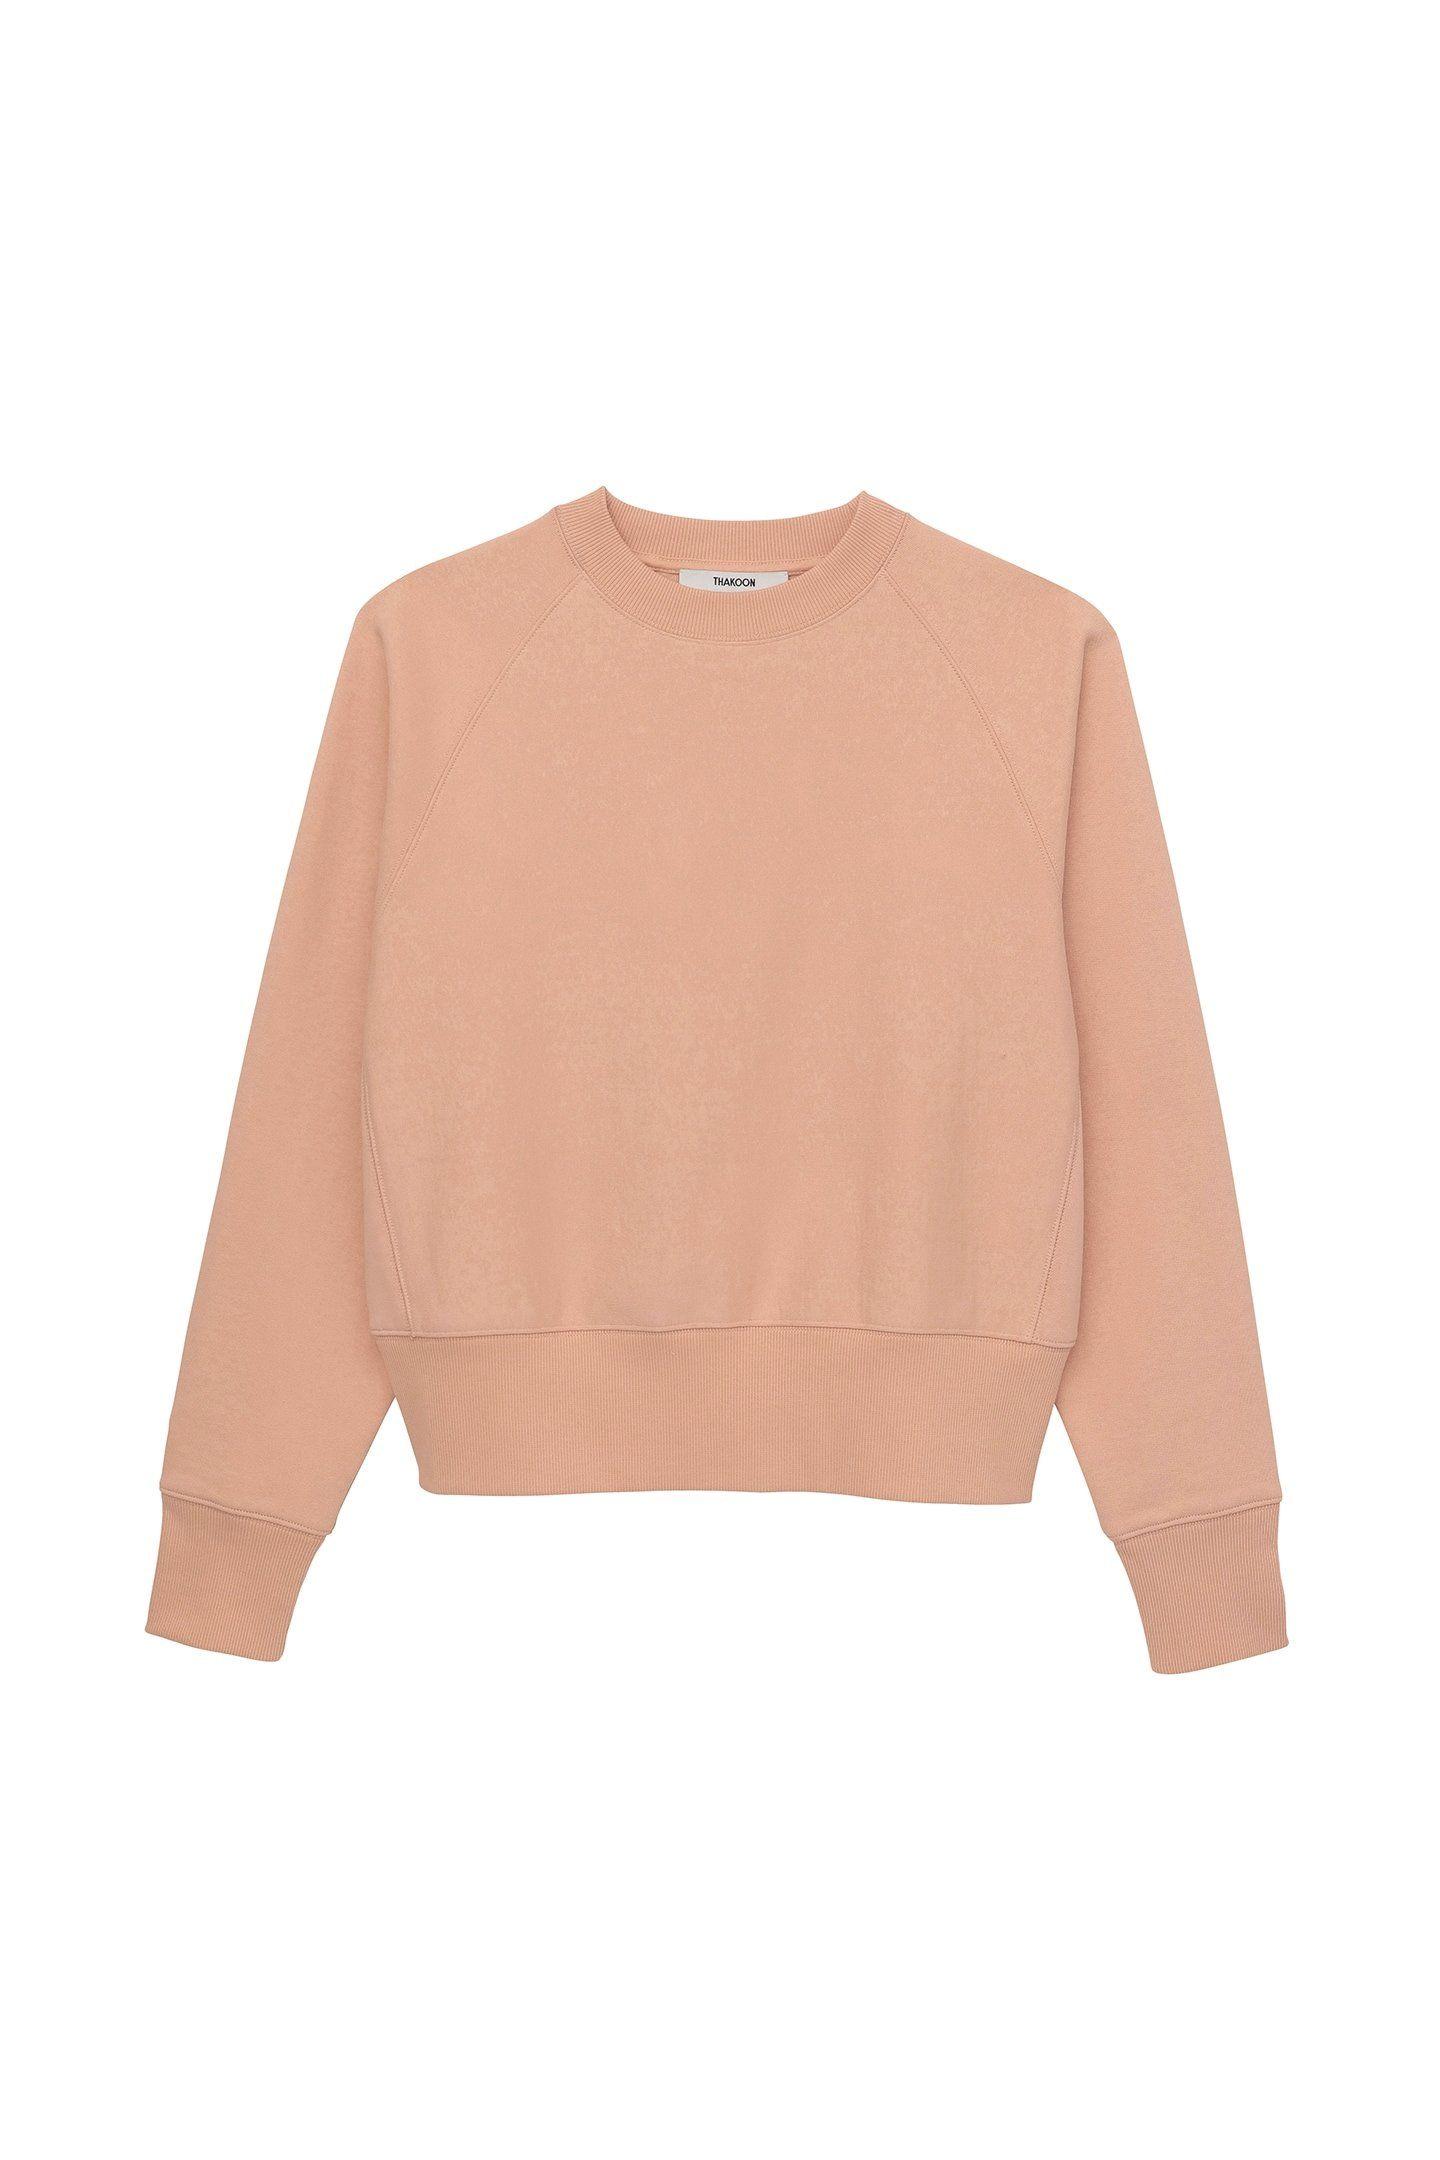 Crewneck Sweatshirt Peach Thakoon Crew Neck Sweatshirt Sweatshirts Chunky Turtleneck Sweater [ 2160 x 1440 Pixel ]